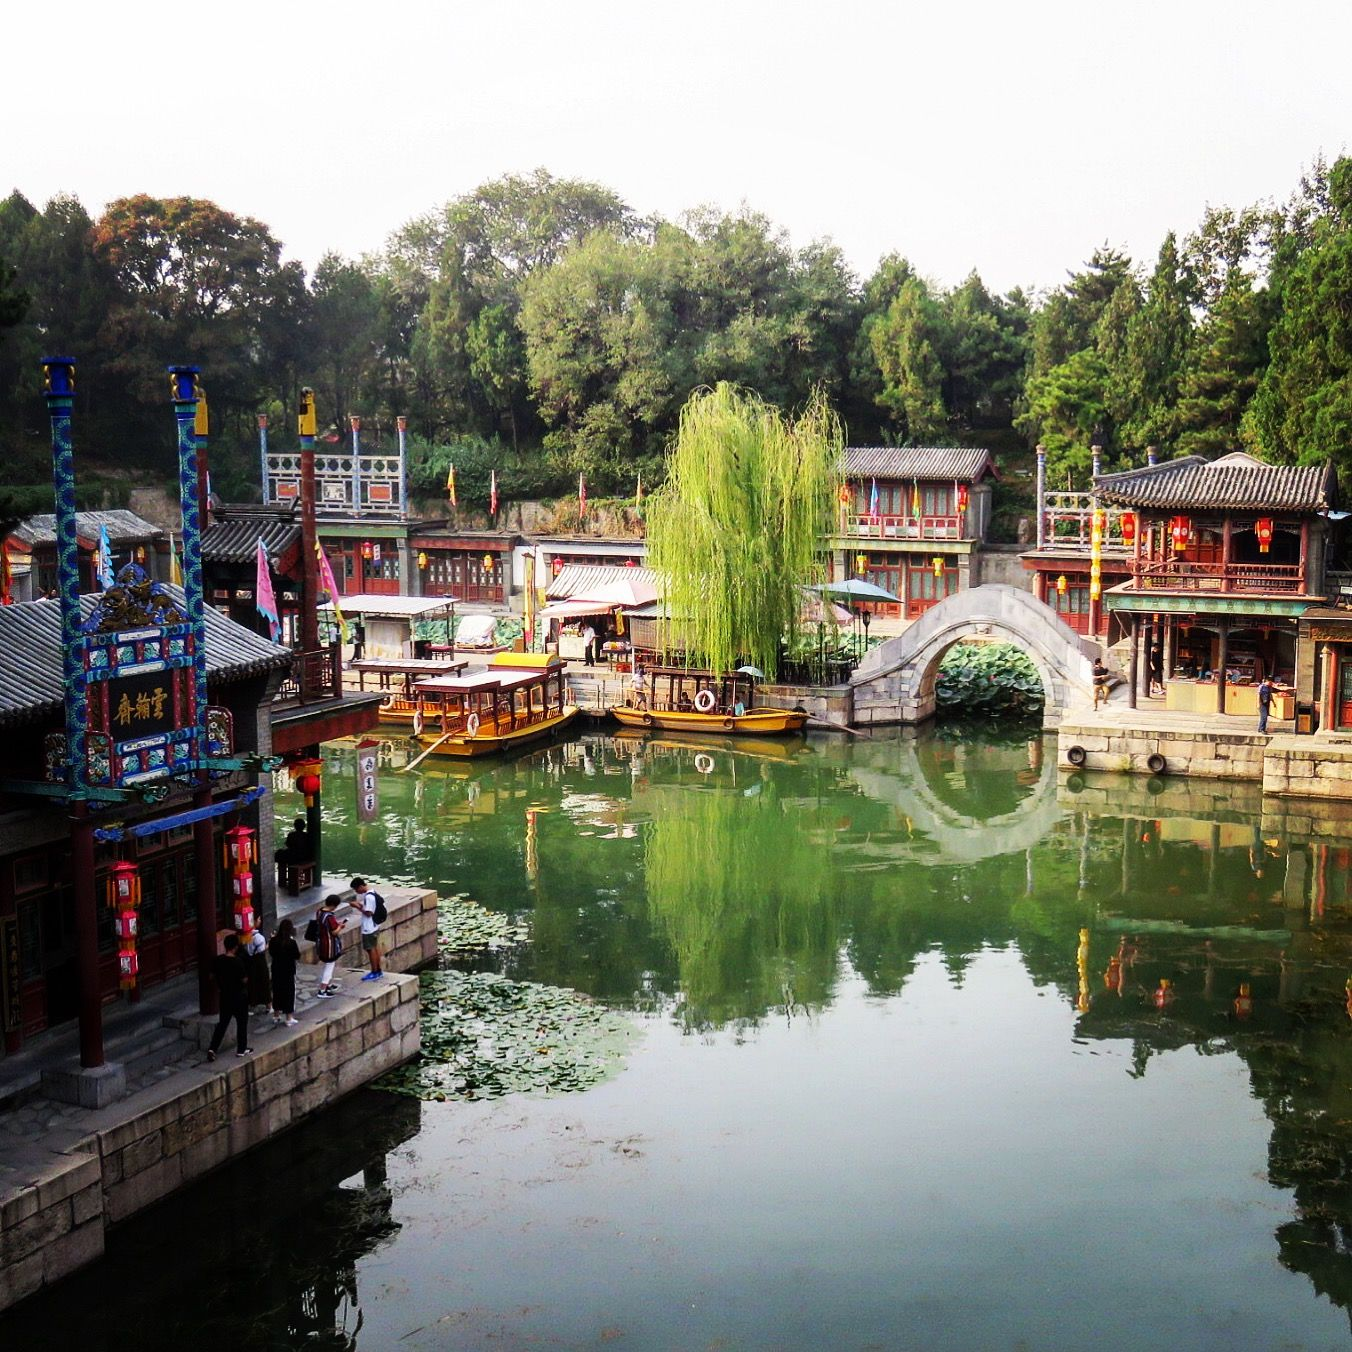 Картинки по запросу summer palace beijing site:pinterest.com